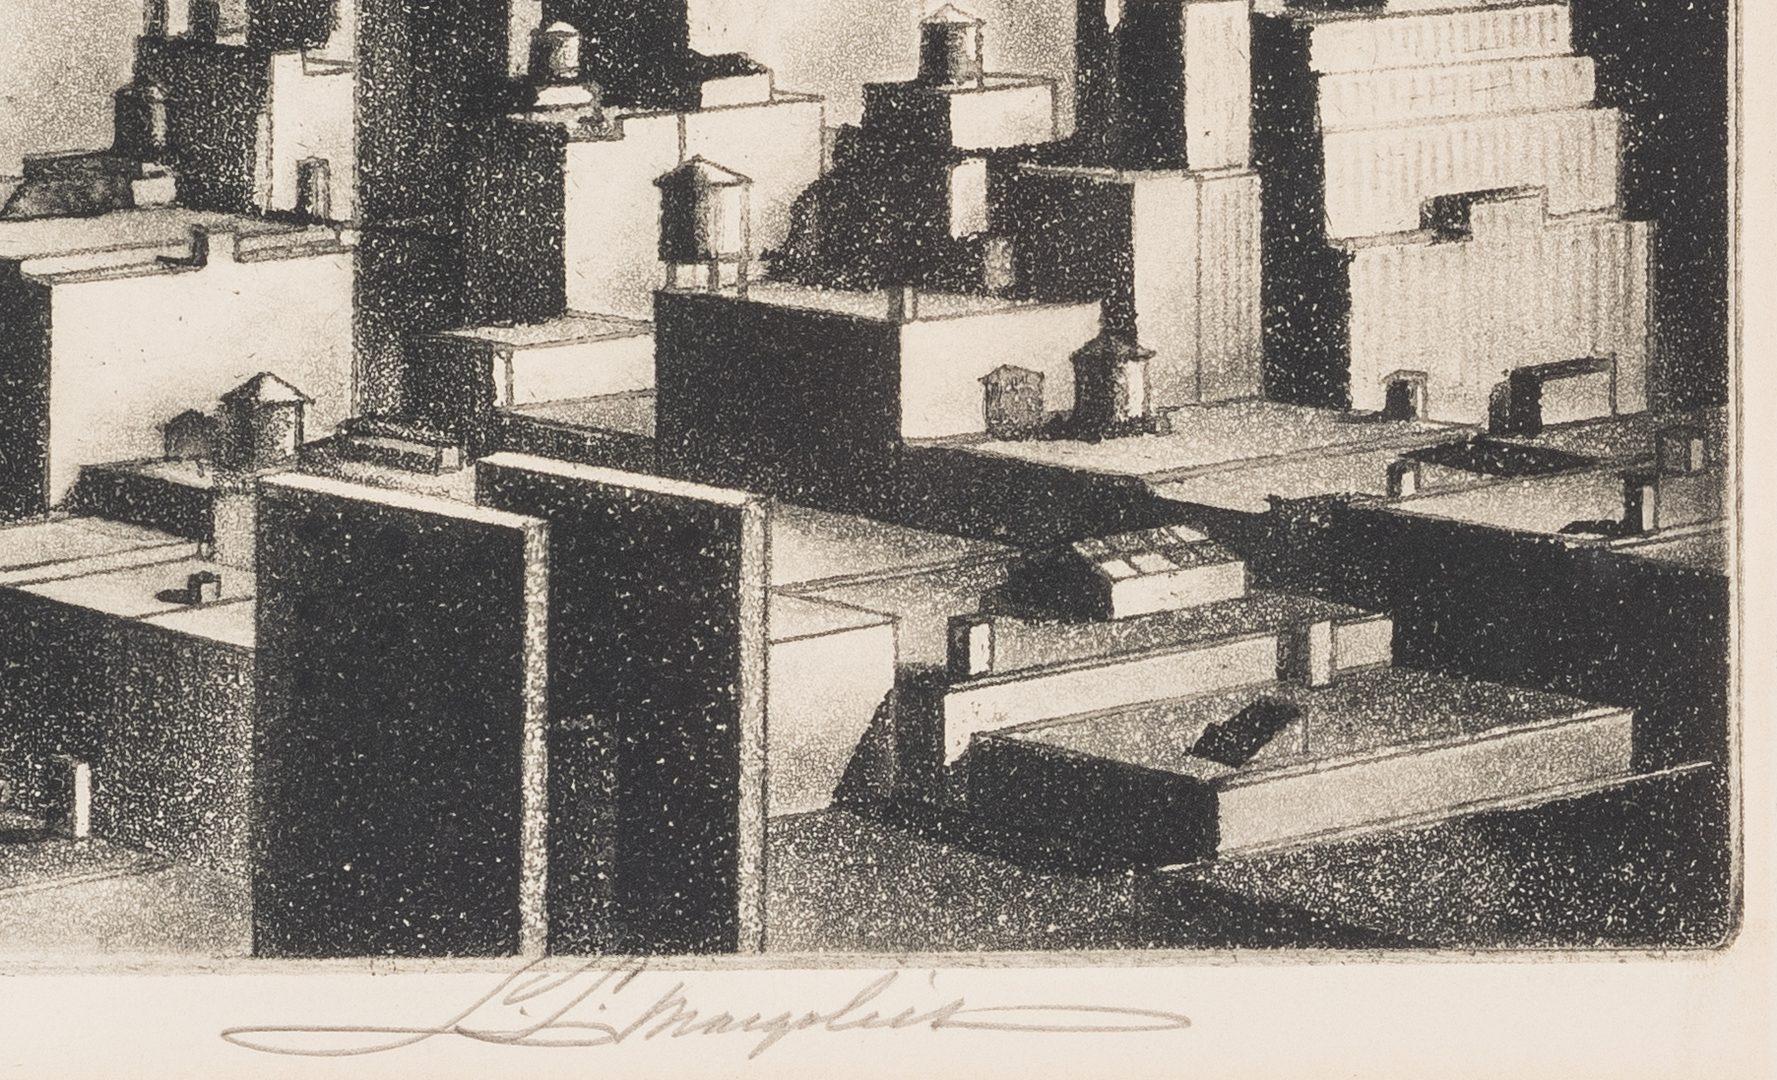 Lot 125: Samuel L. Margolies Industrial Etching, Builders of Babylon